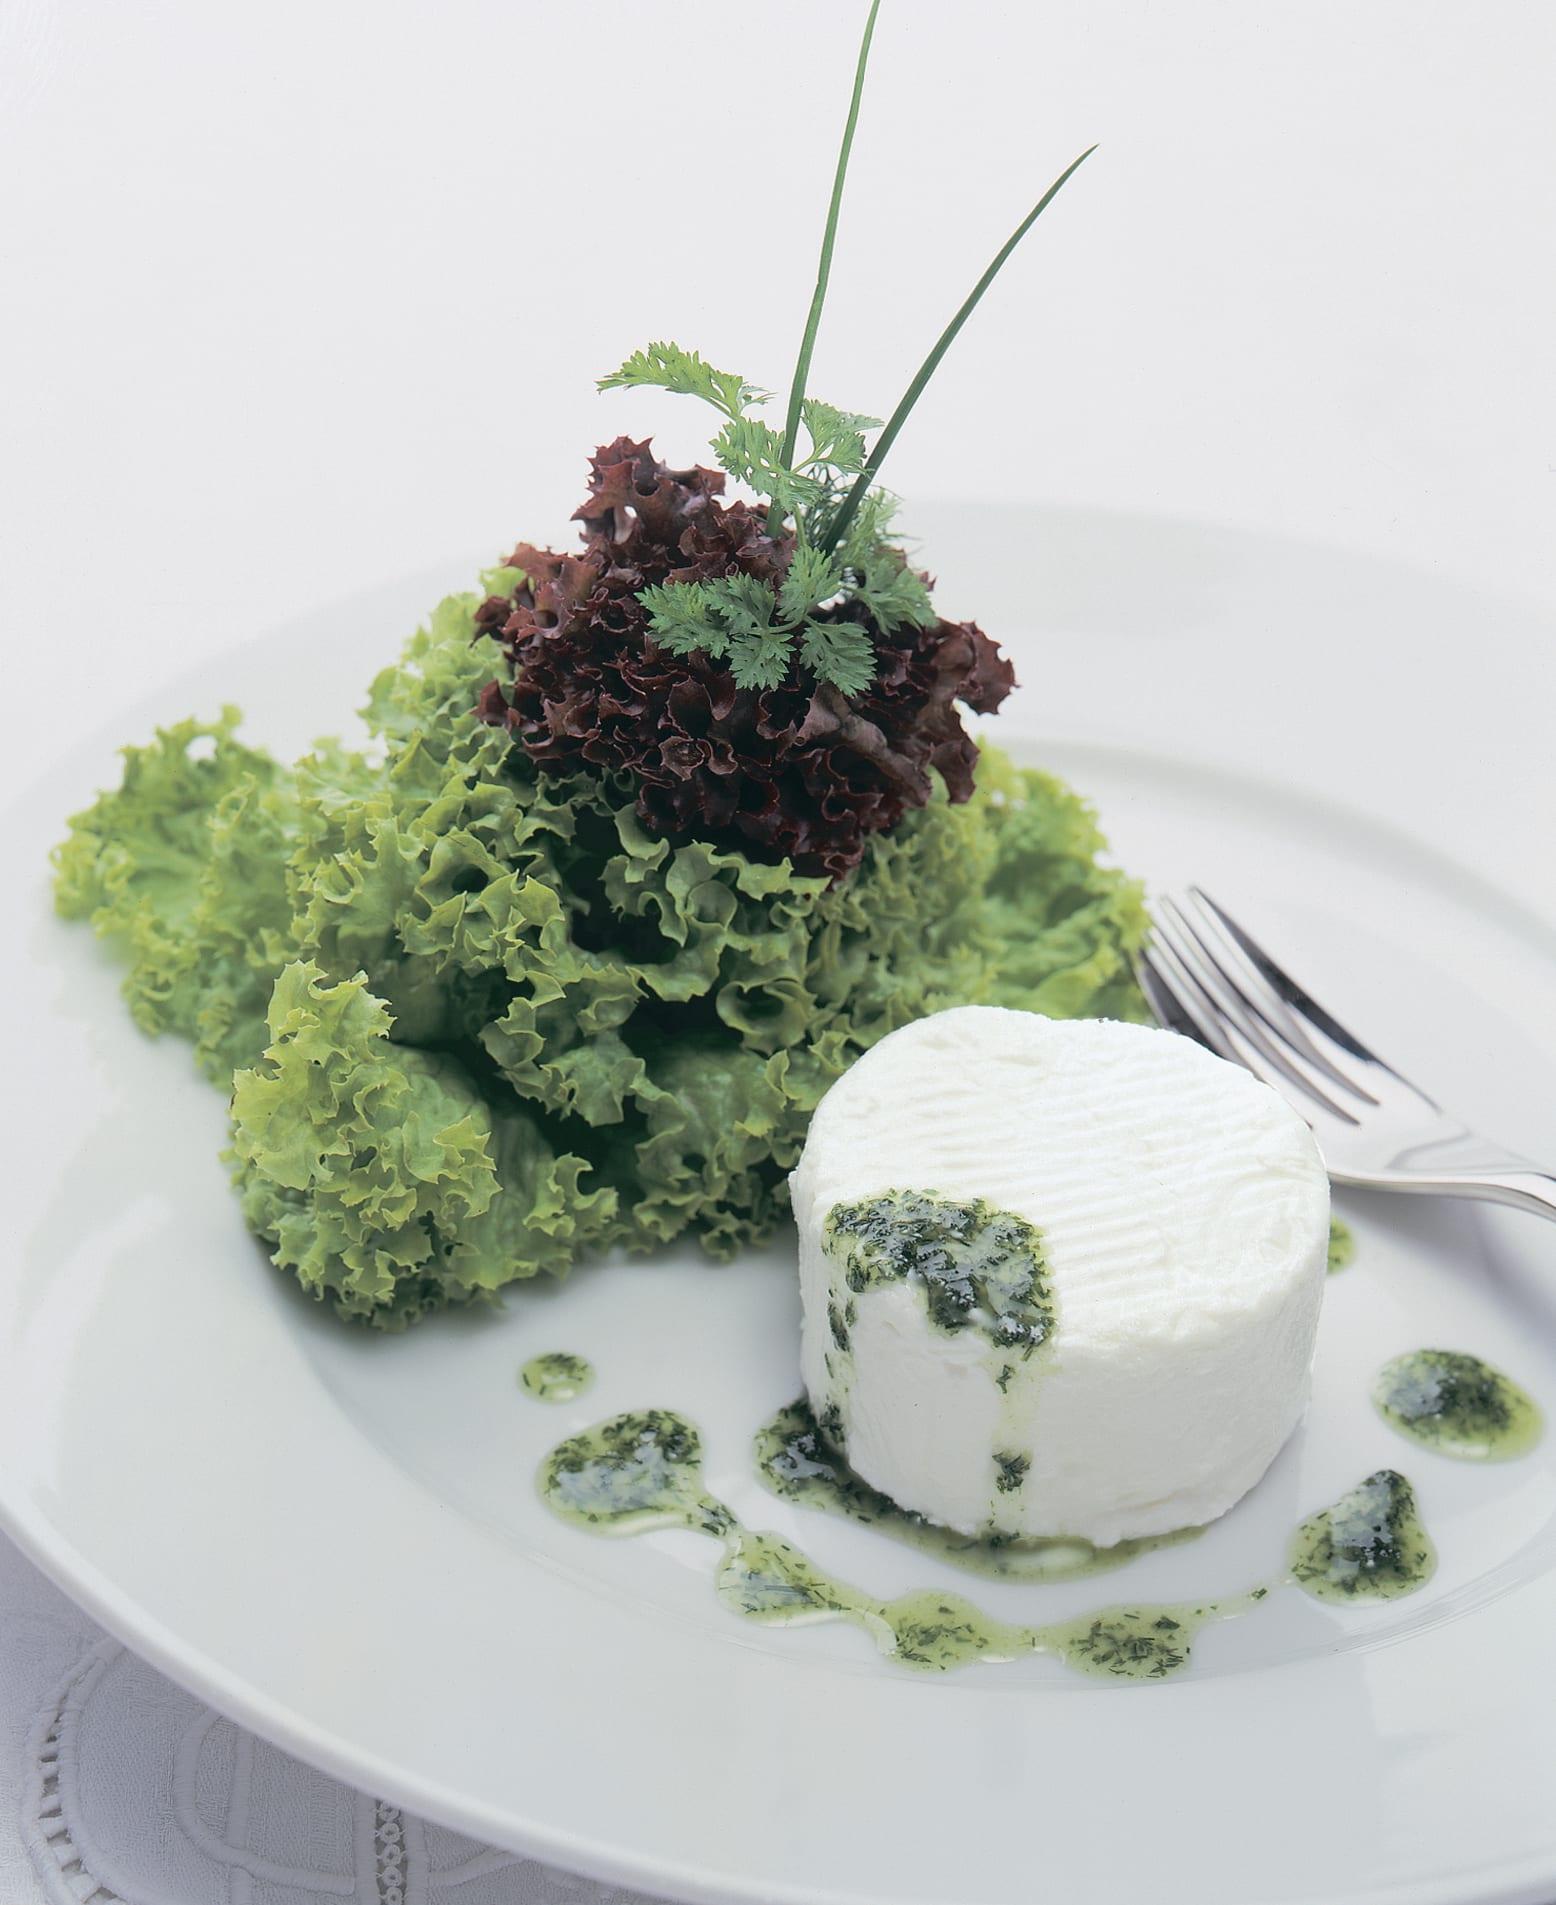 Kräutersalat mit Tessiner Ziegenkäse an Feigensenfsauce